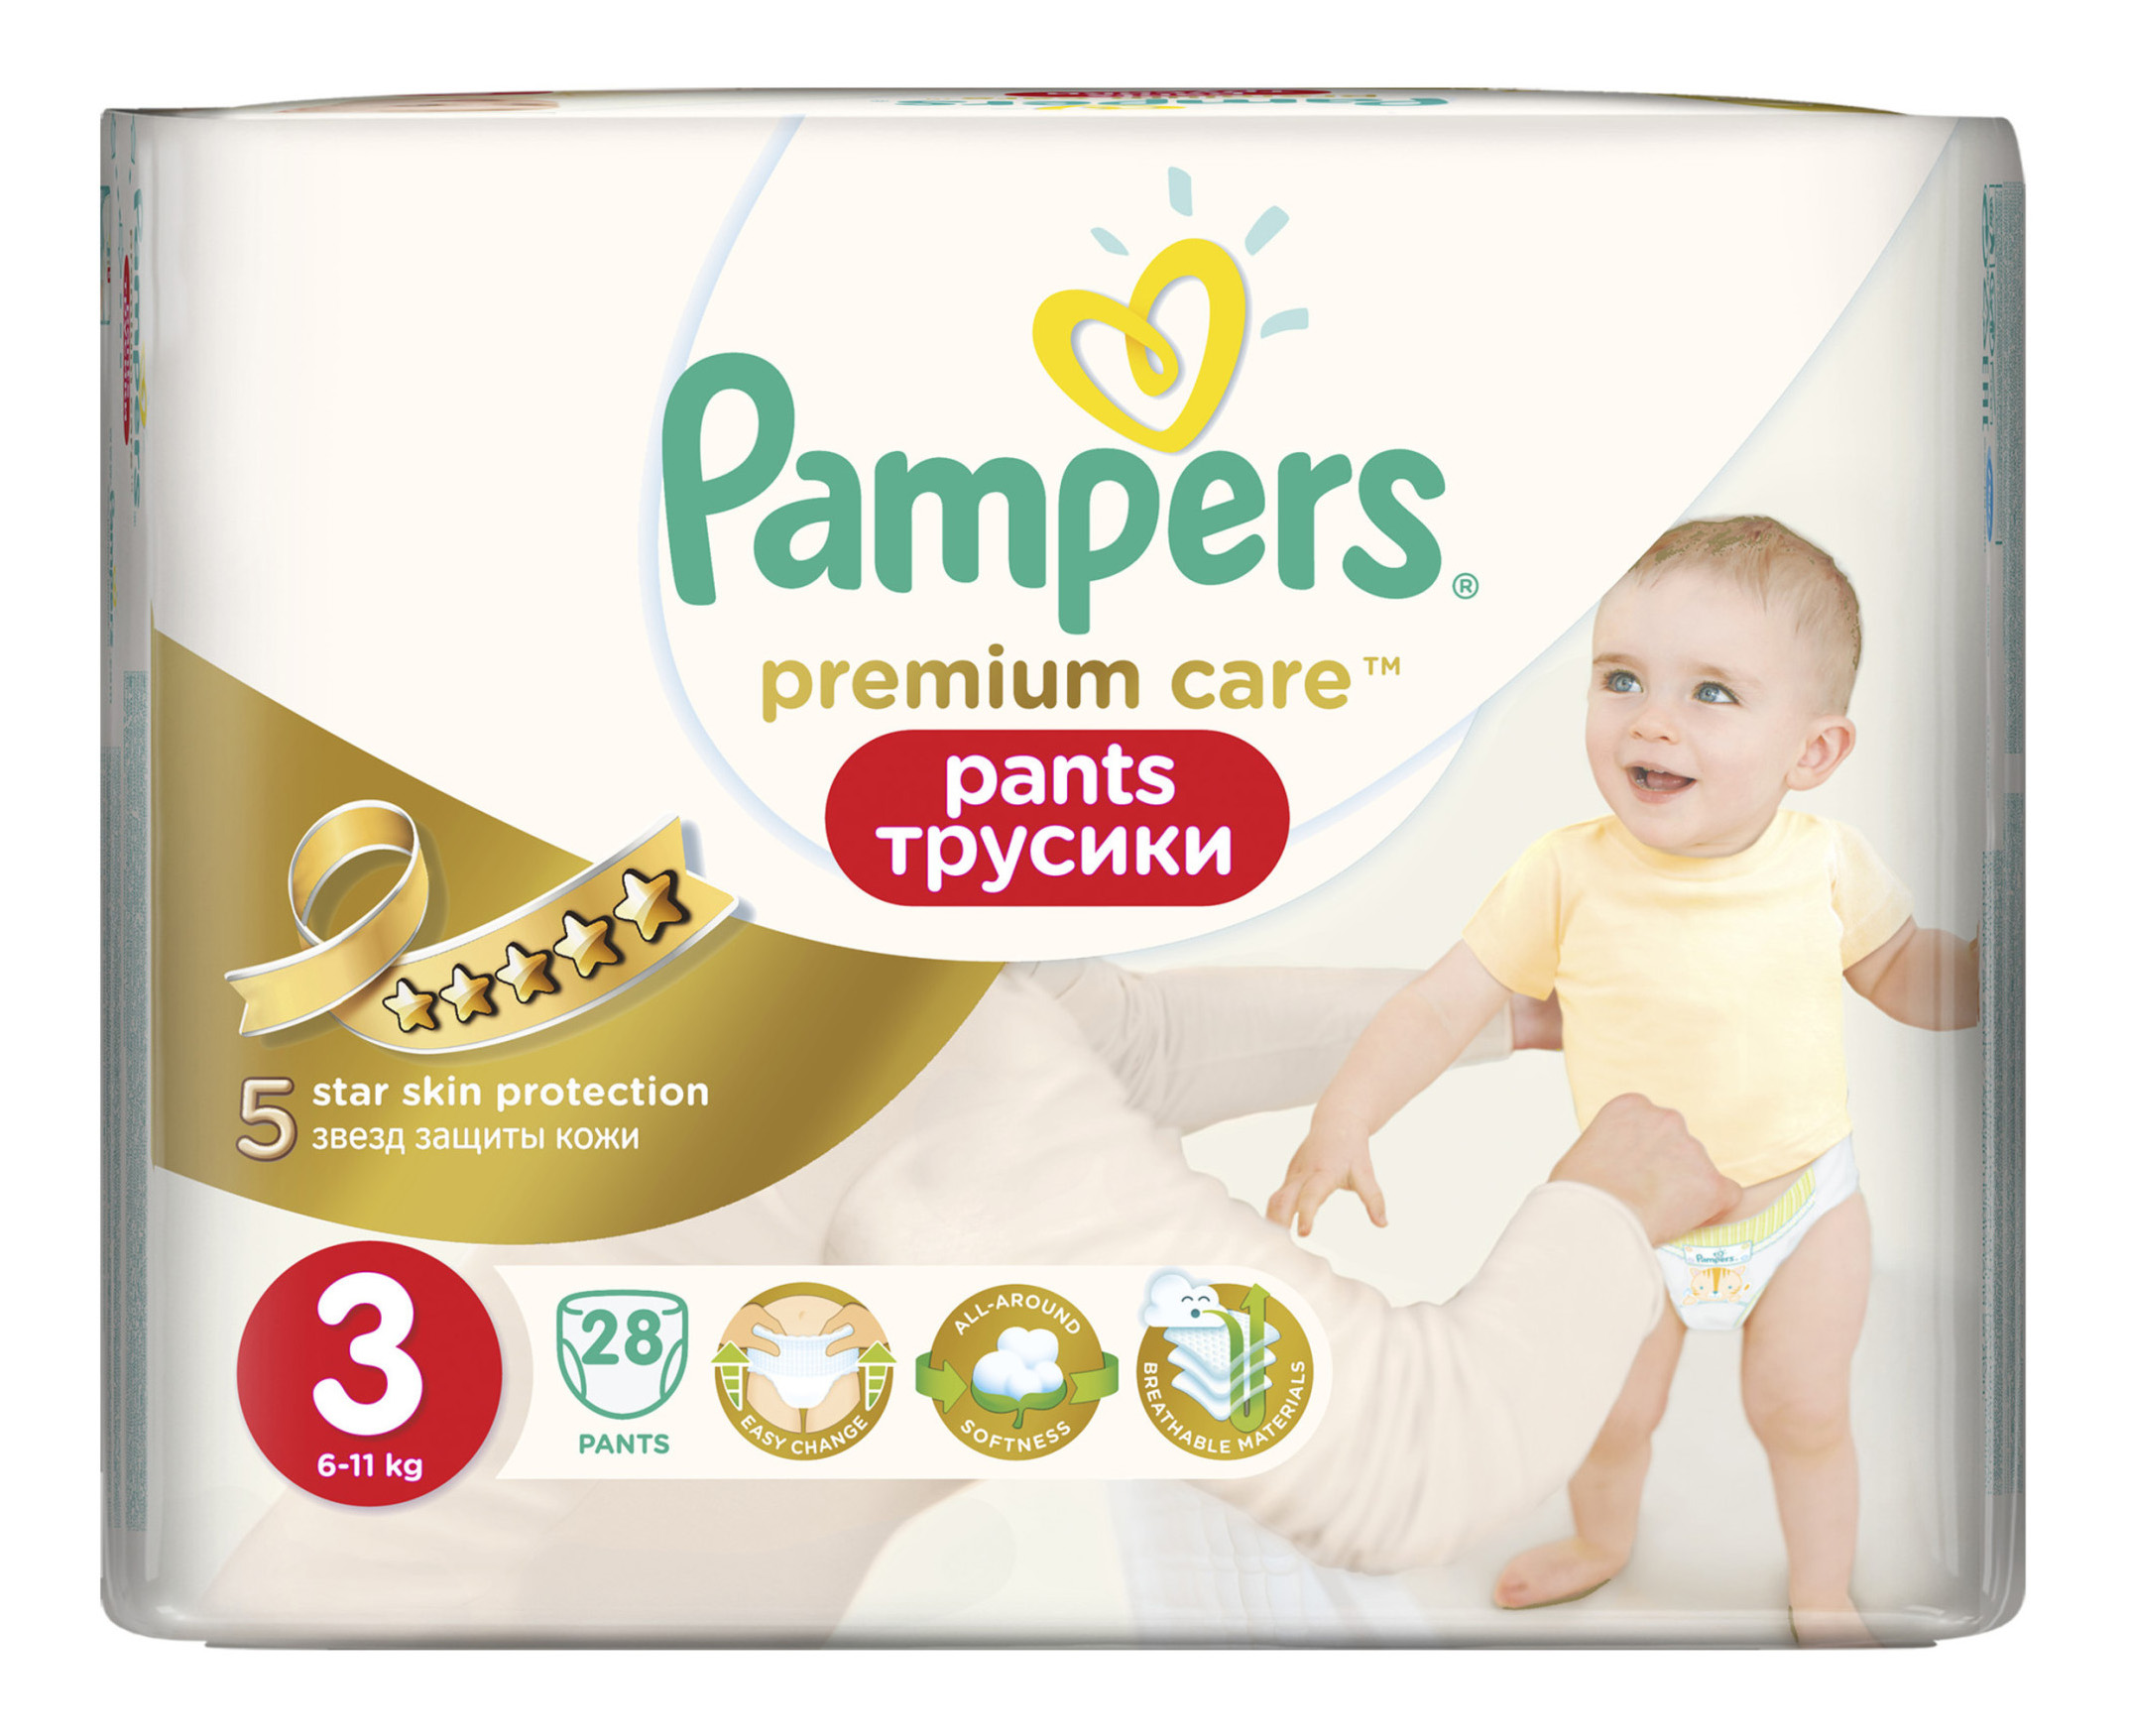 Подгузники-трусики Pampers Premium Care Pants 3 (6-11 кг), 28 шт.